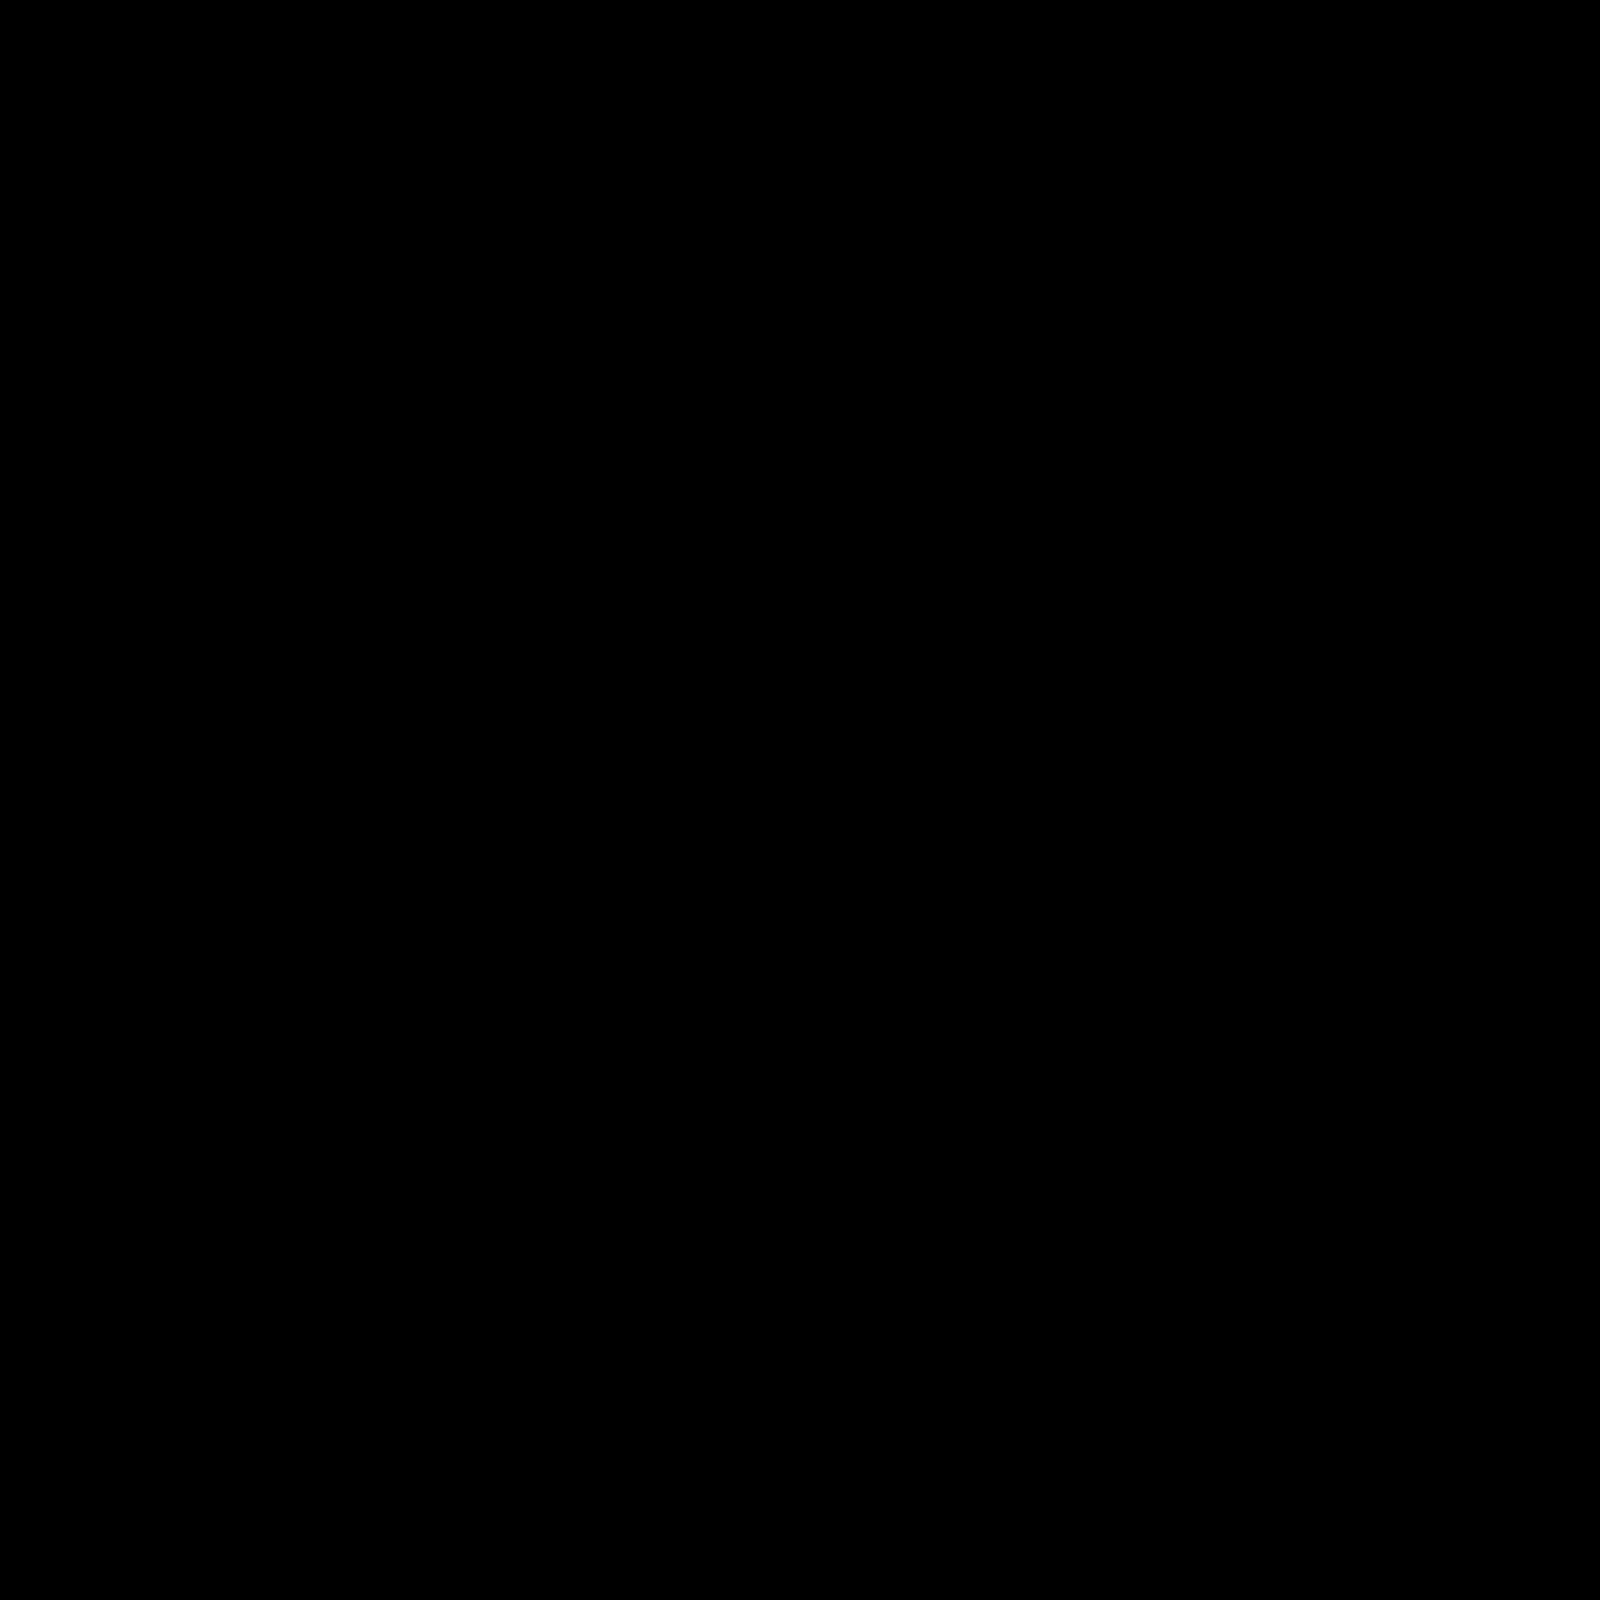 Thimble Filled icon